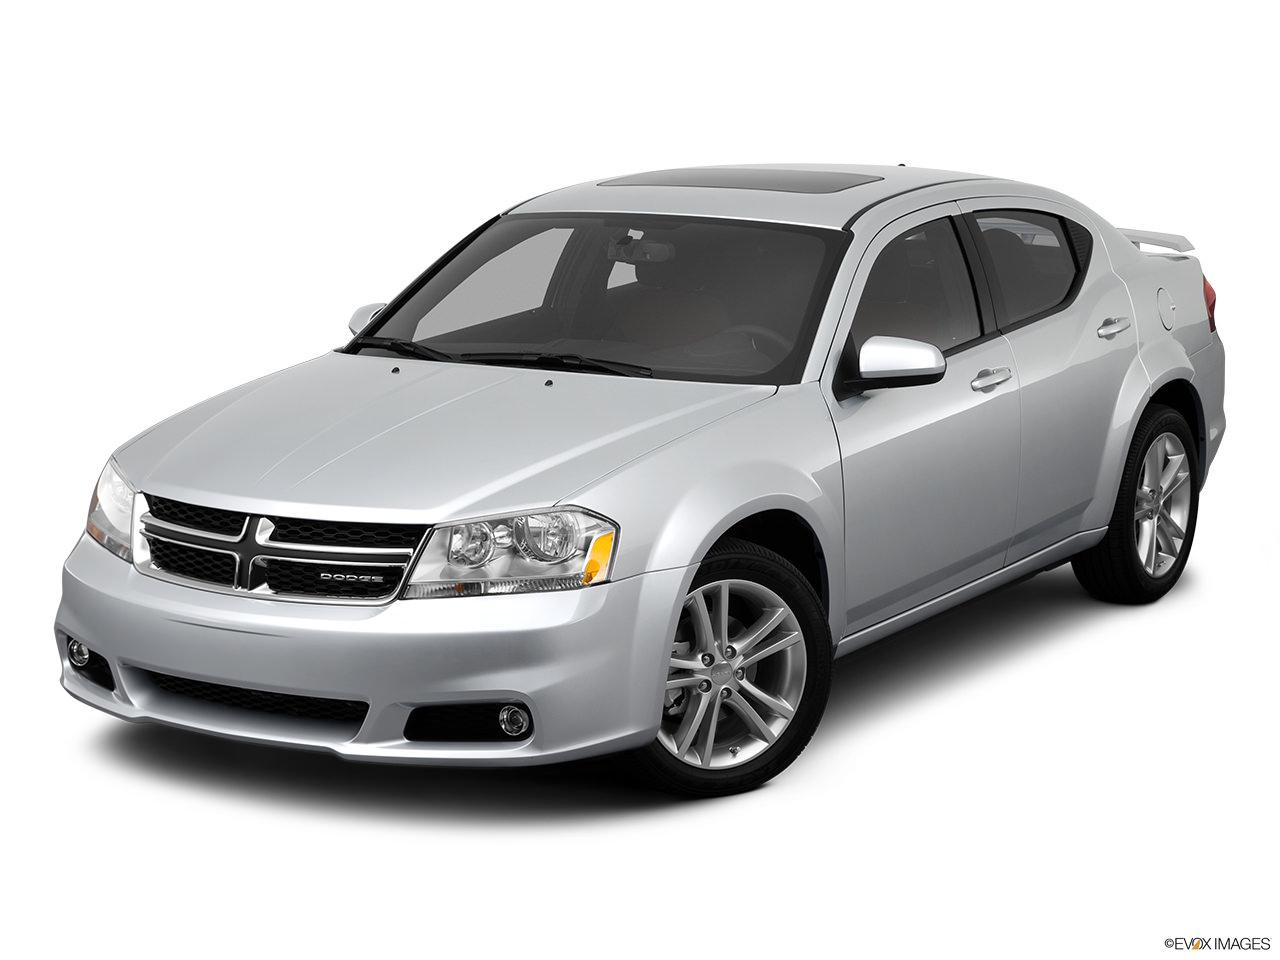 Astonishing A Buyers Guide To The 2012 Dodge Avenger Yourmechanic Advice Wiring Cloud Itislusmarecoveryedborg